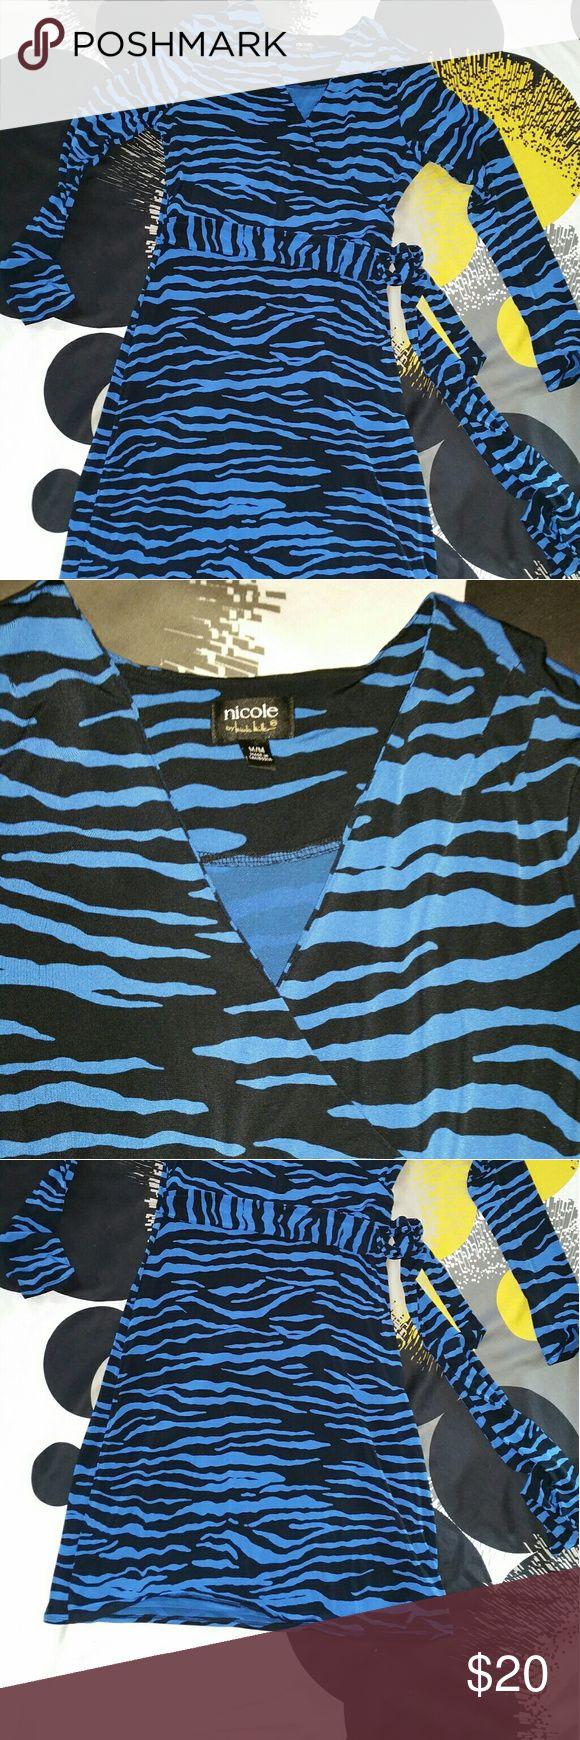 Nicole by Nicole Miller waist tie dress Blue black animal print ,polyester spandex,  v neck long sleeve dress Nicole by Nicole Miller Dresses Long Sleeve